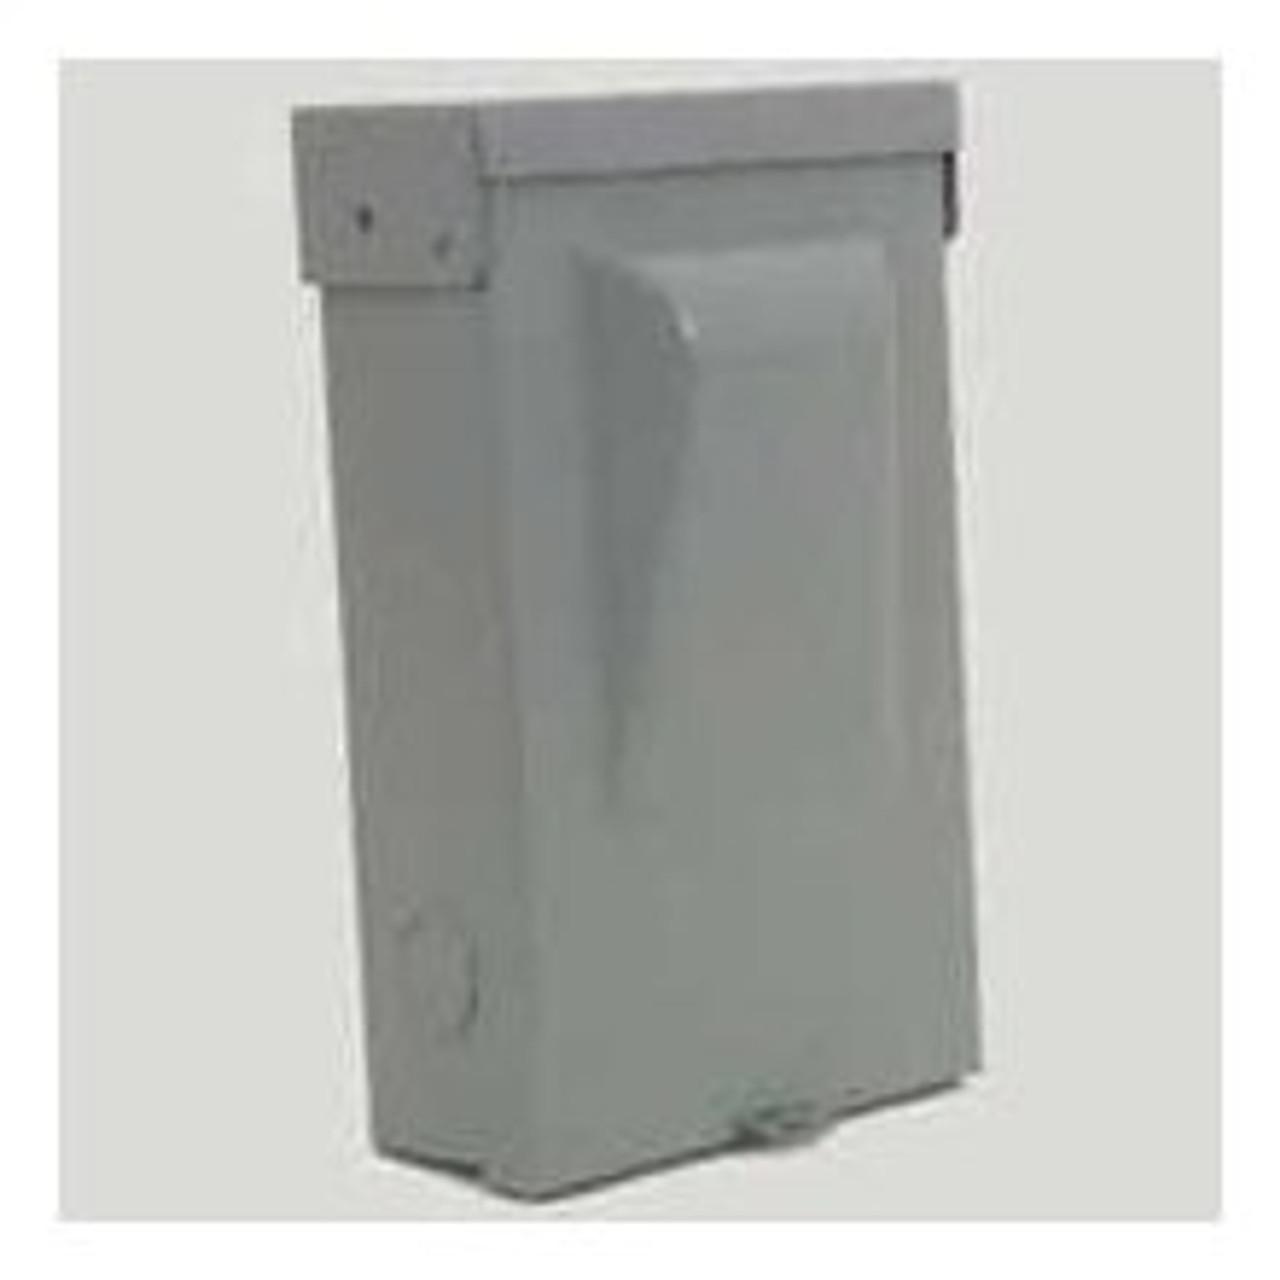 60 Amp Disconnect Fuse Box - Mars #80317 MAR80317 - Indoor Comfort SupplyIndoor Comfort Supply